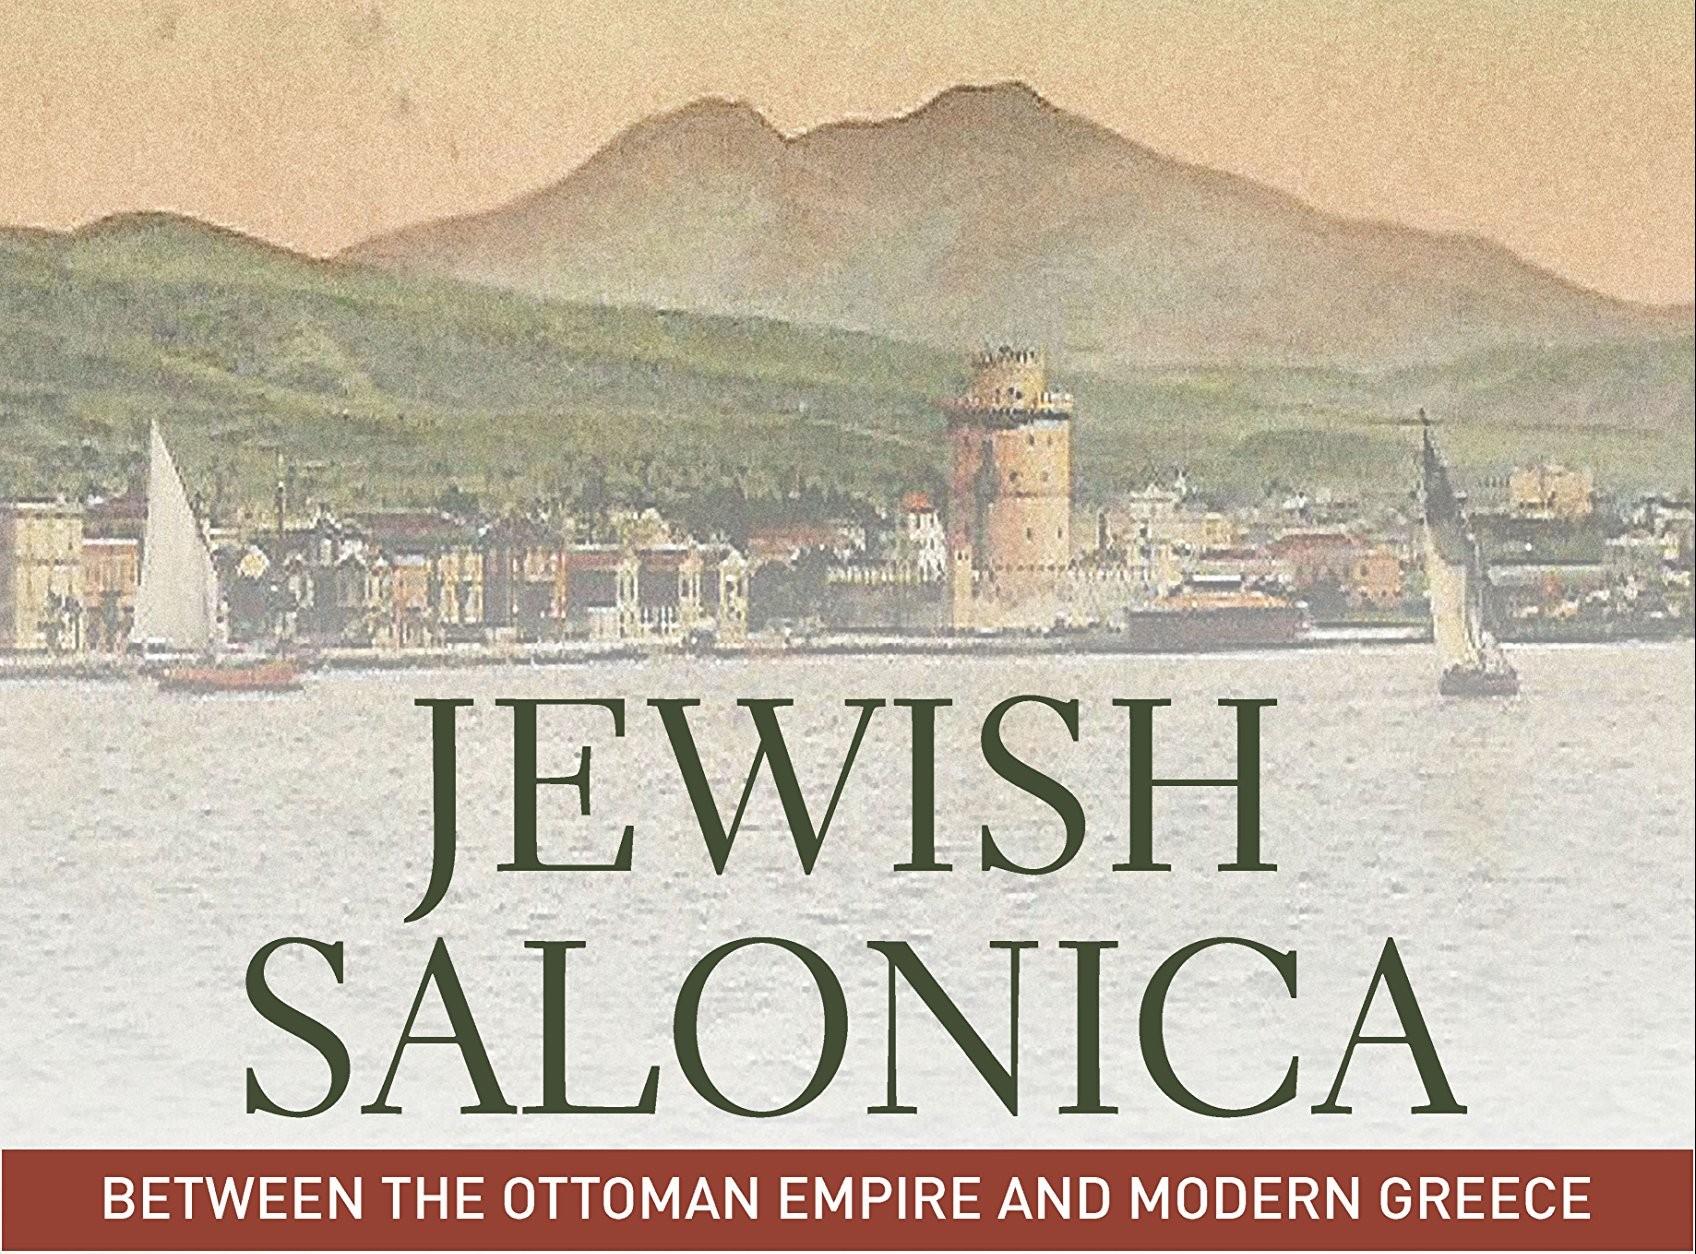 Jewish Salonica Book Launch on 11/3